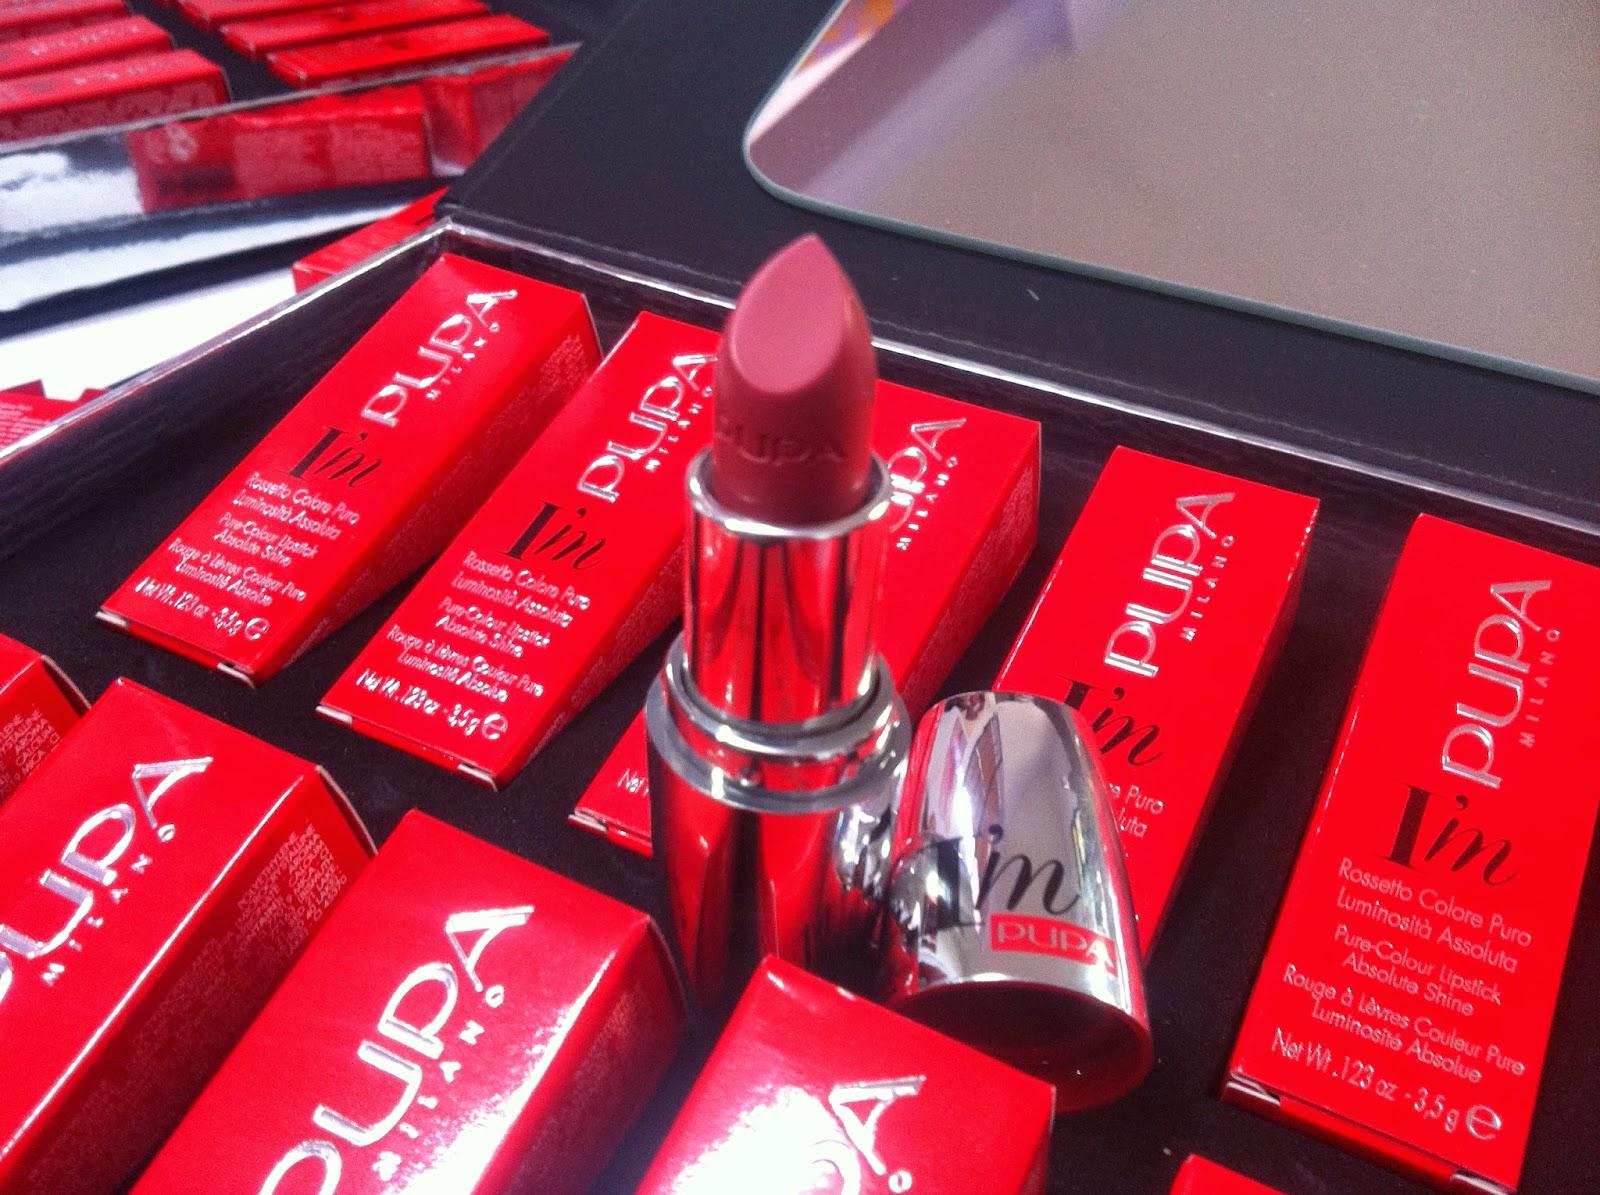 PUPA rossetti I'M Lipstick swatches